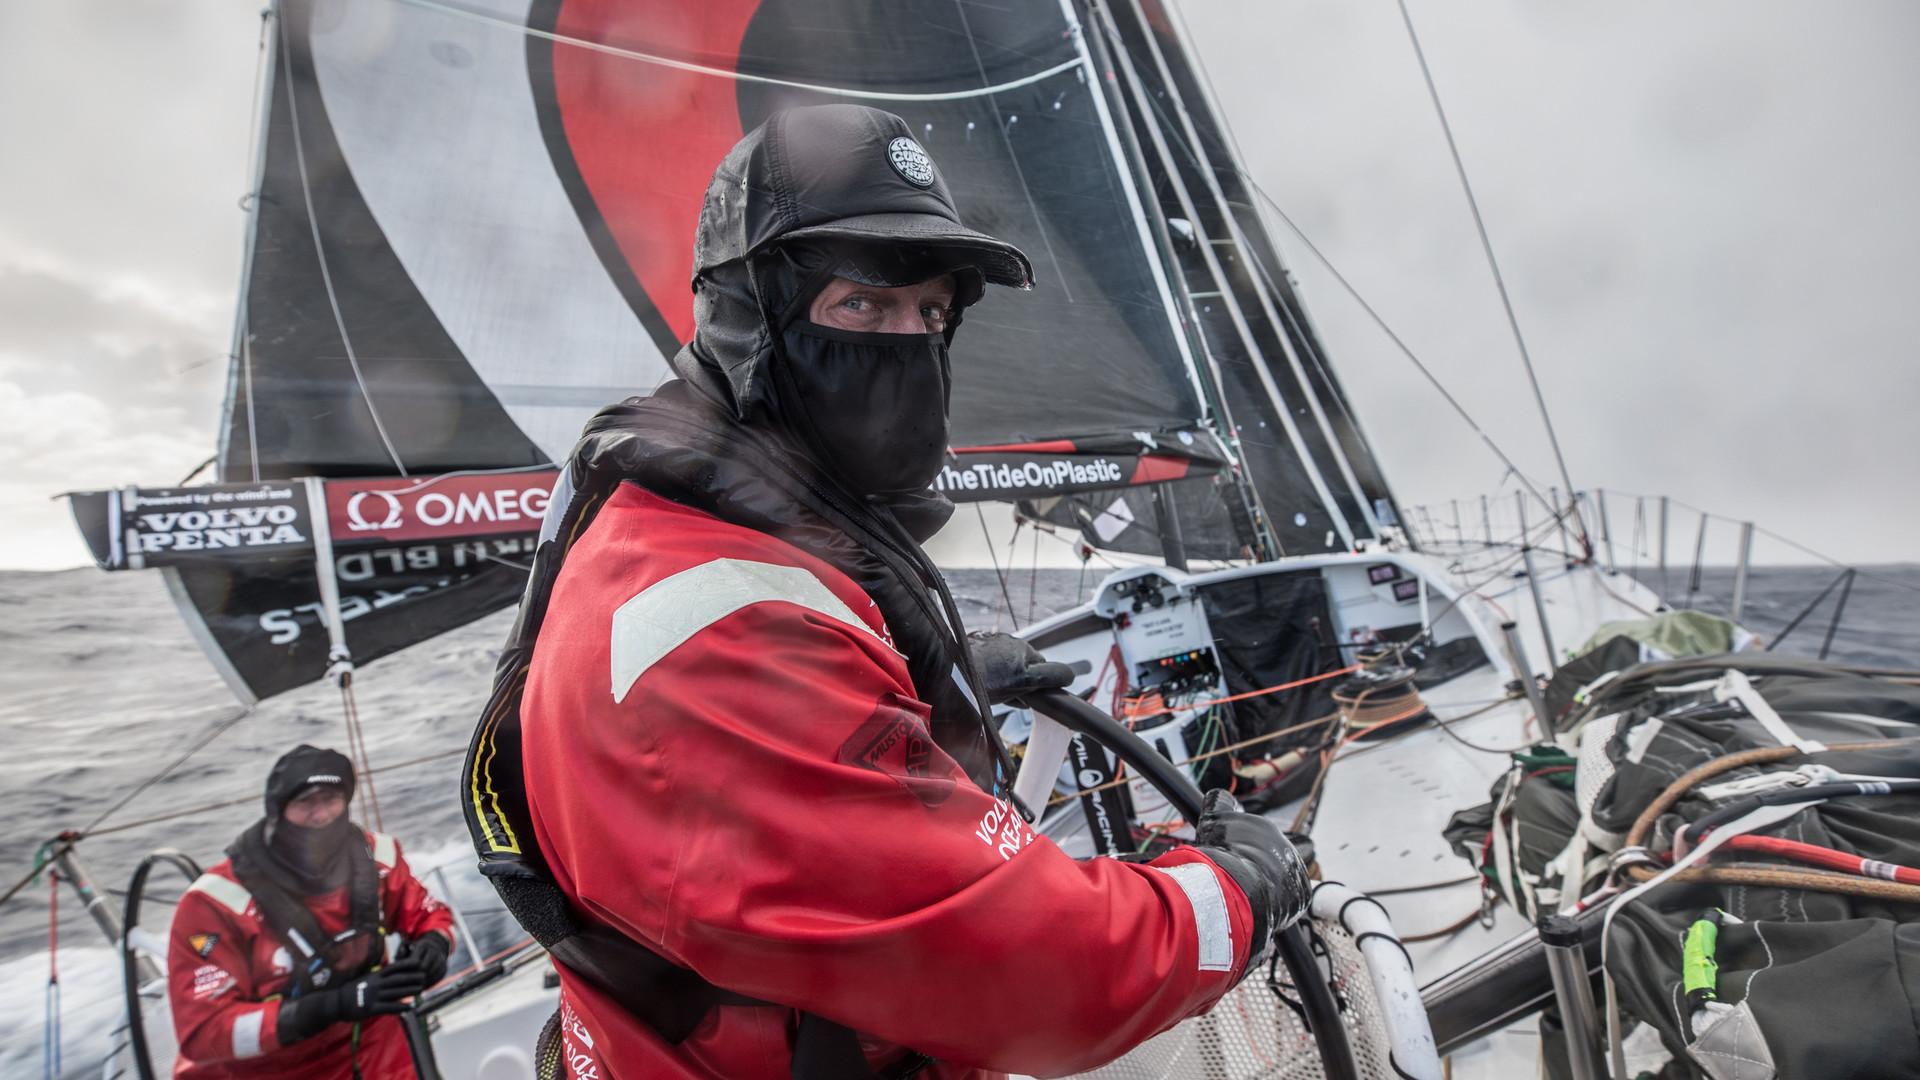 Un marin britannique disparaît lors de la Volvo Ocean Race — Voile